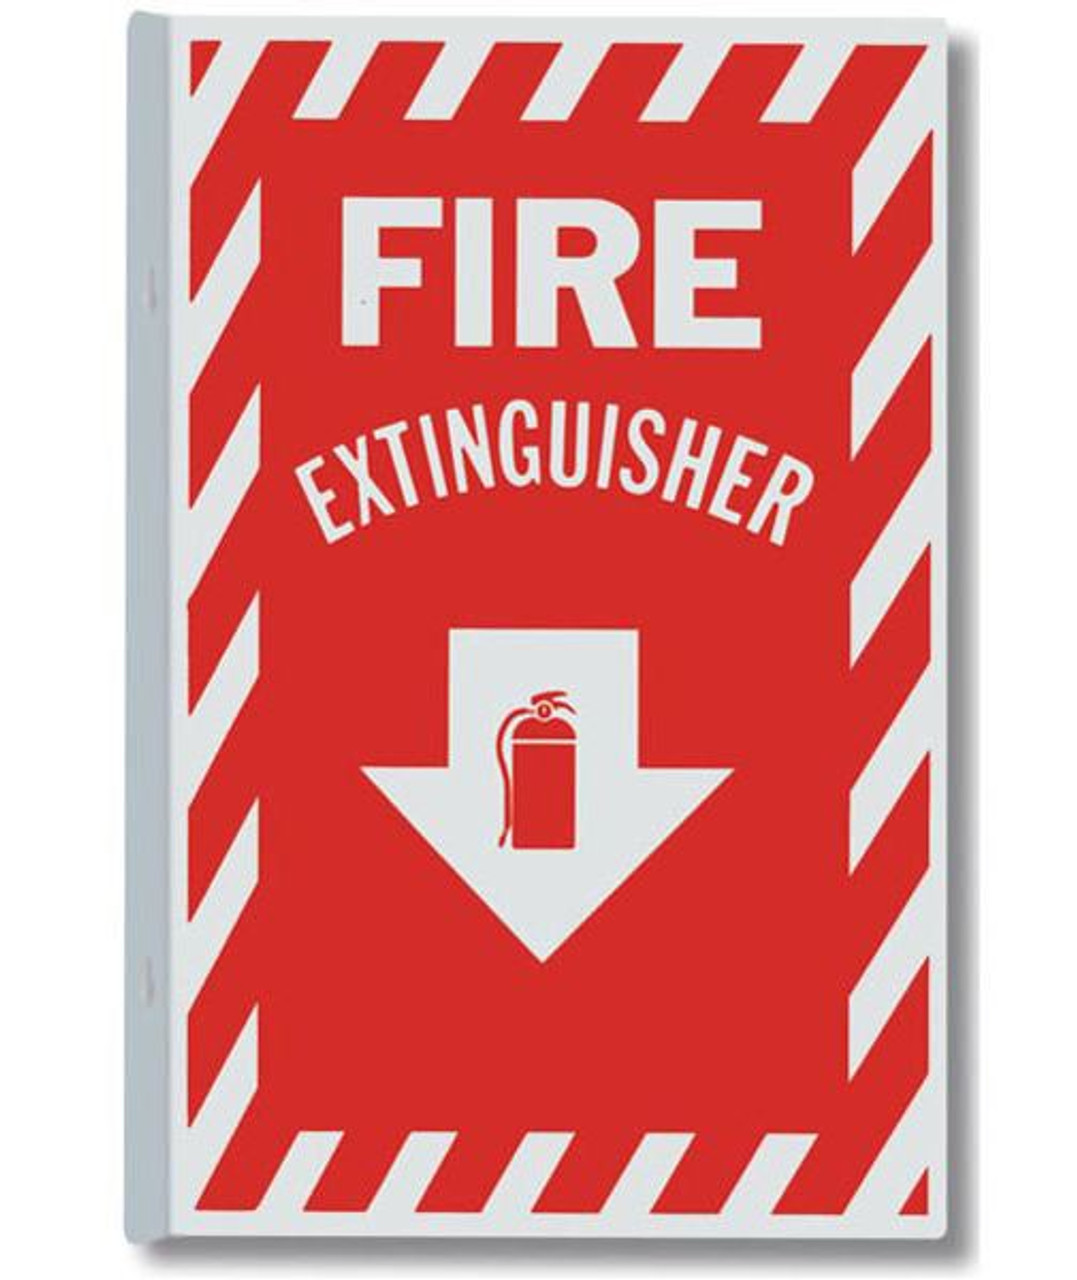 "AWM114 - Aluminum Fire Extinguisher Sign 8"" x 12"""